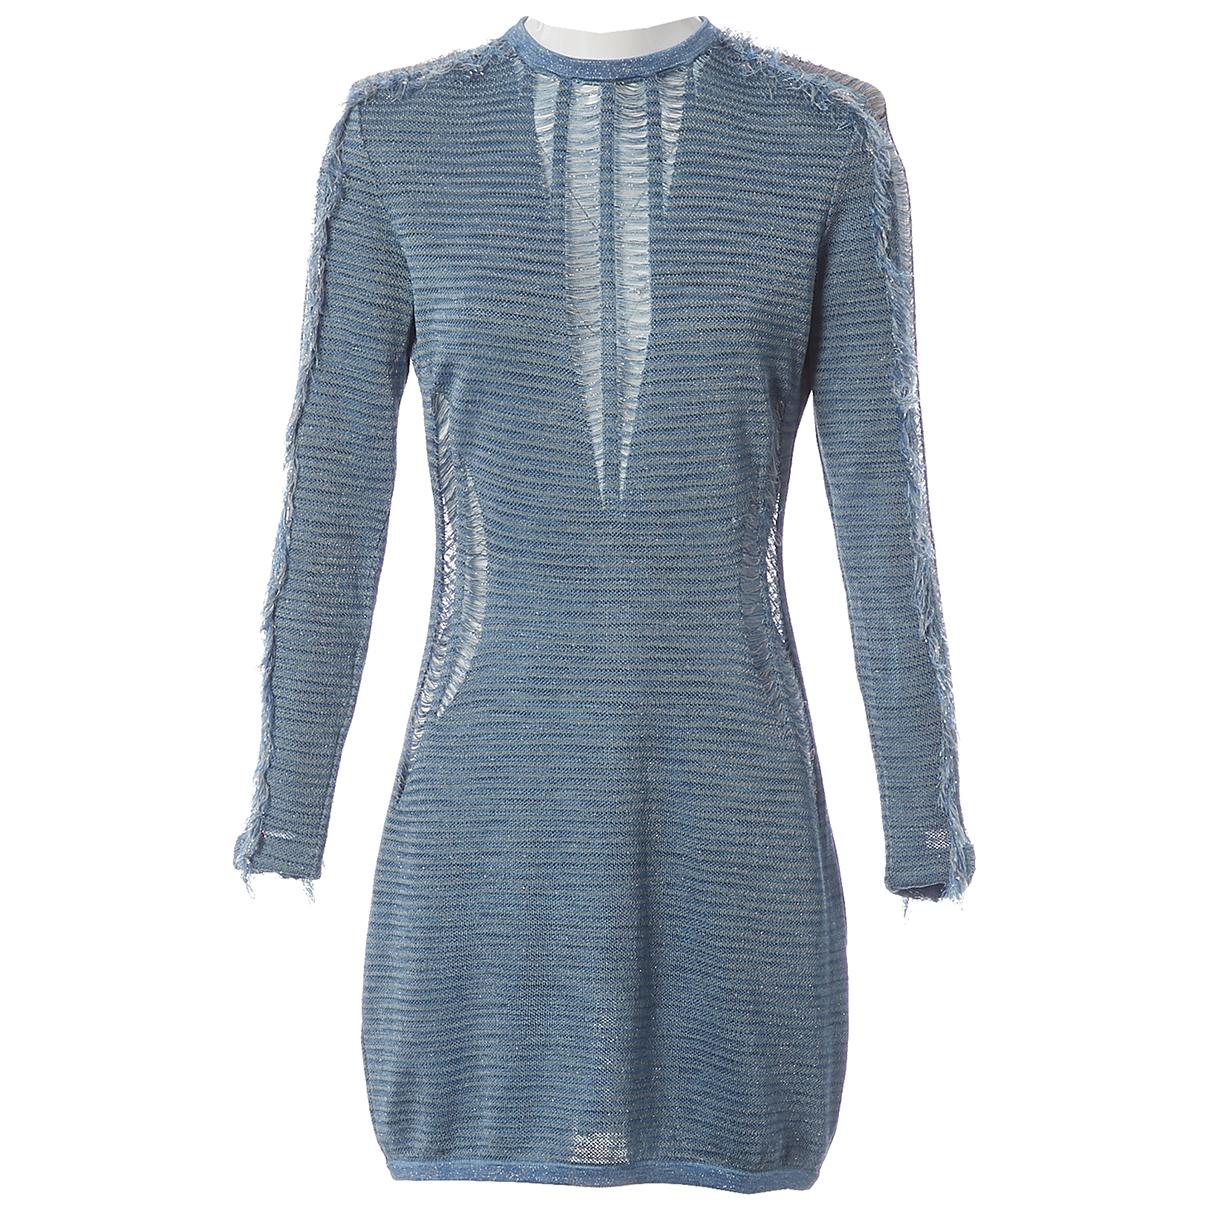 Balmain \N Blue dress for Women 40 FR